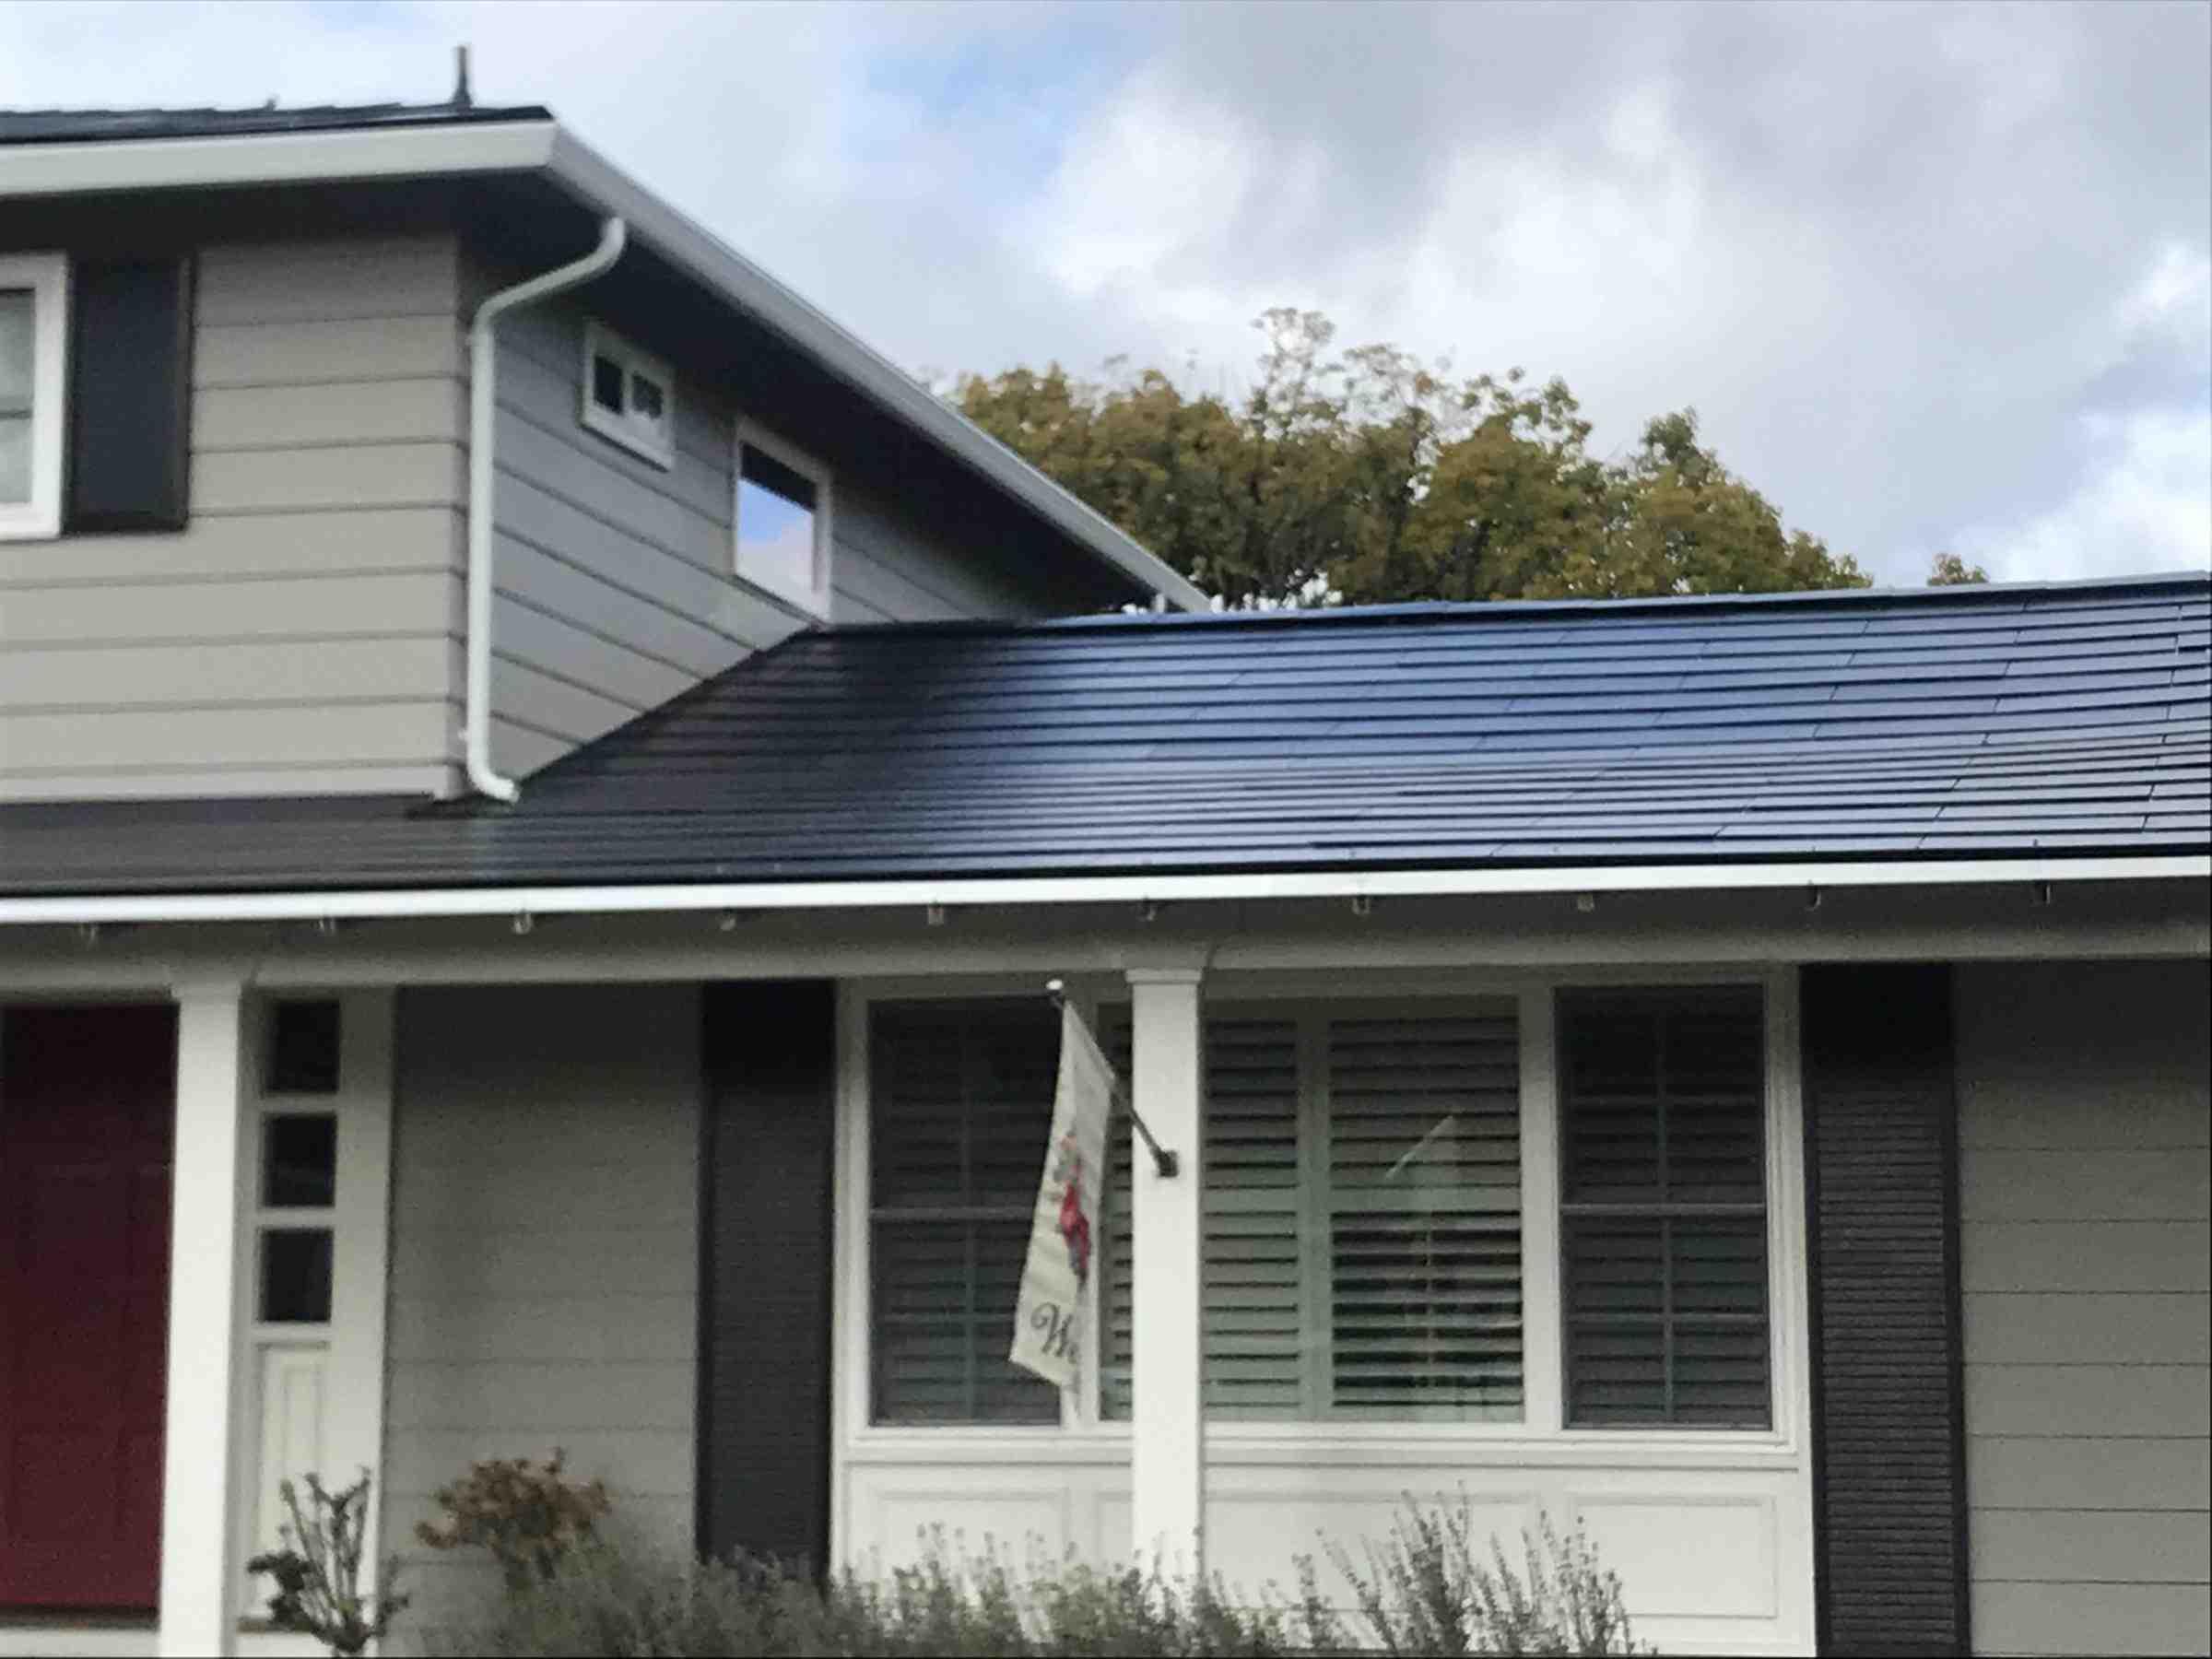 Are Tesla solar tiles worth it?